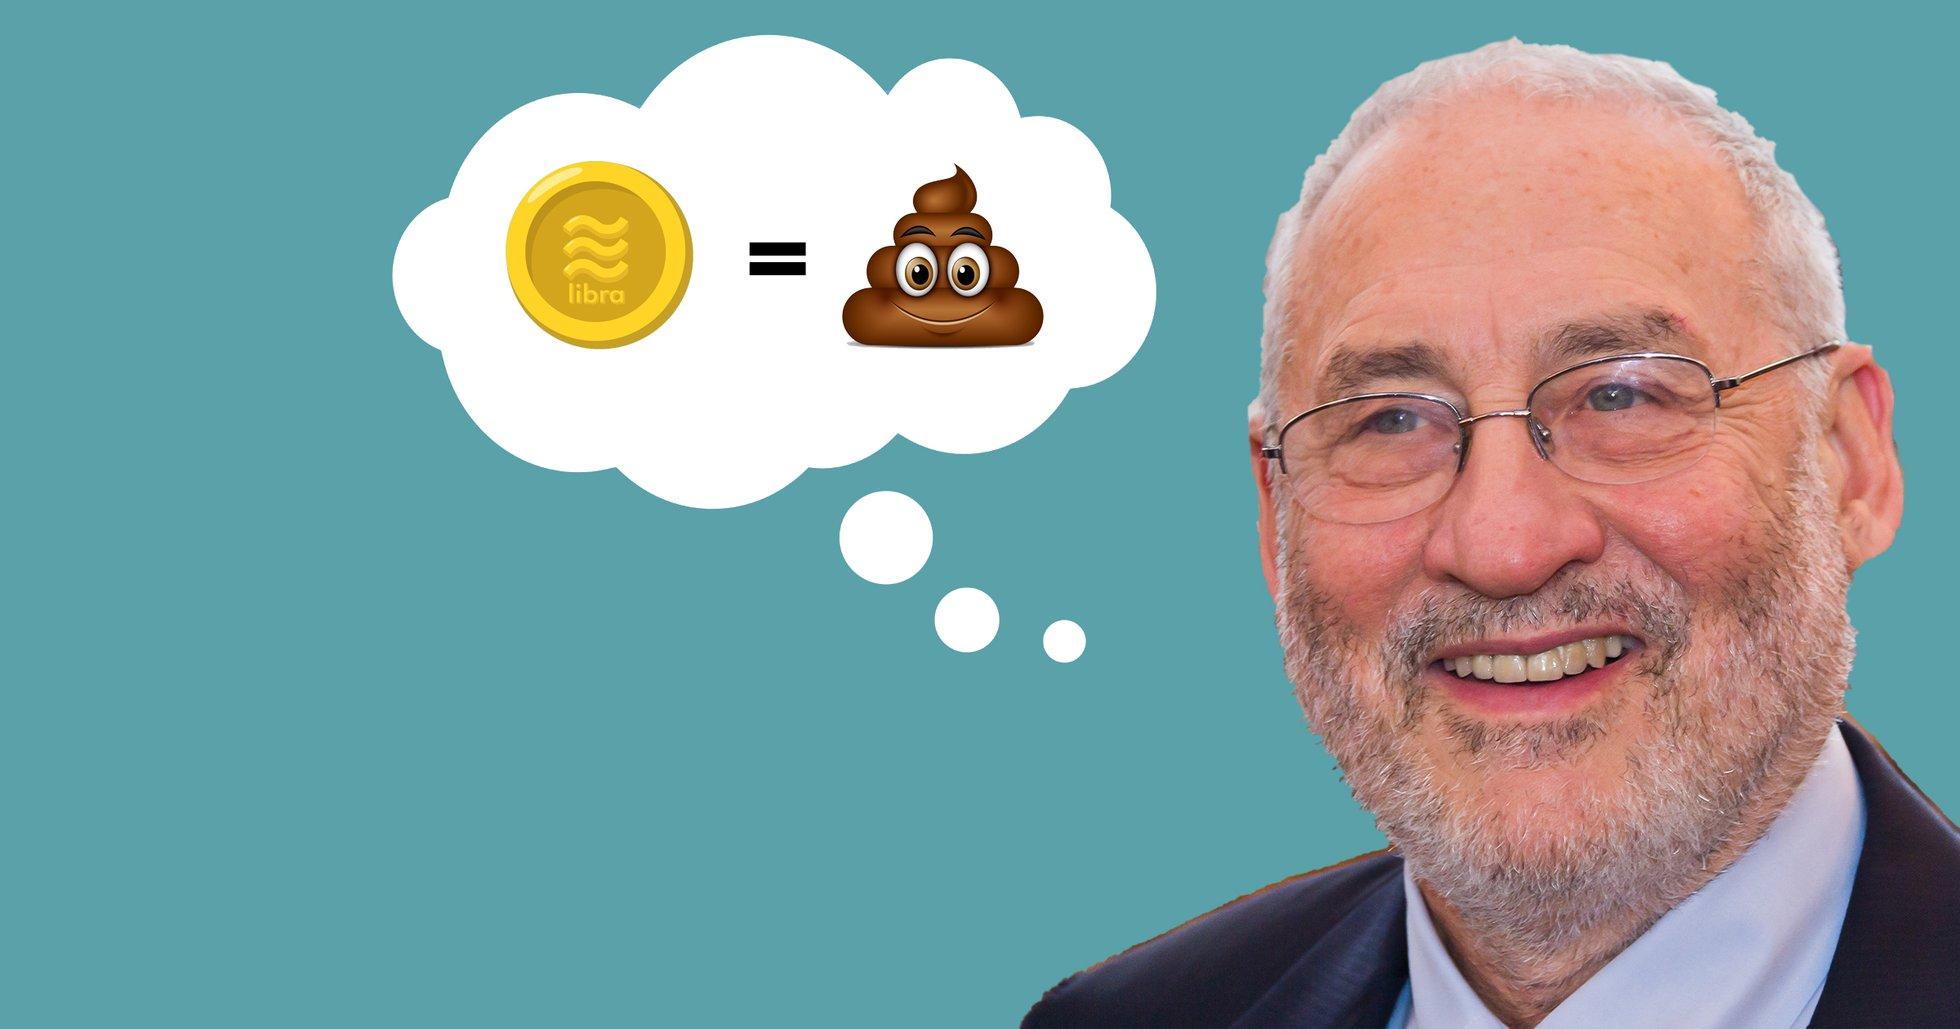 Nobelpristagaren: Bara en dåre skulle lita på Facebooks kryptovaluta libra